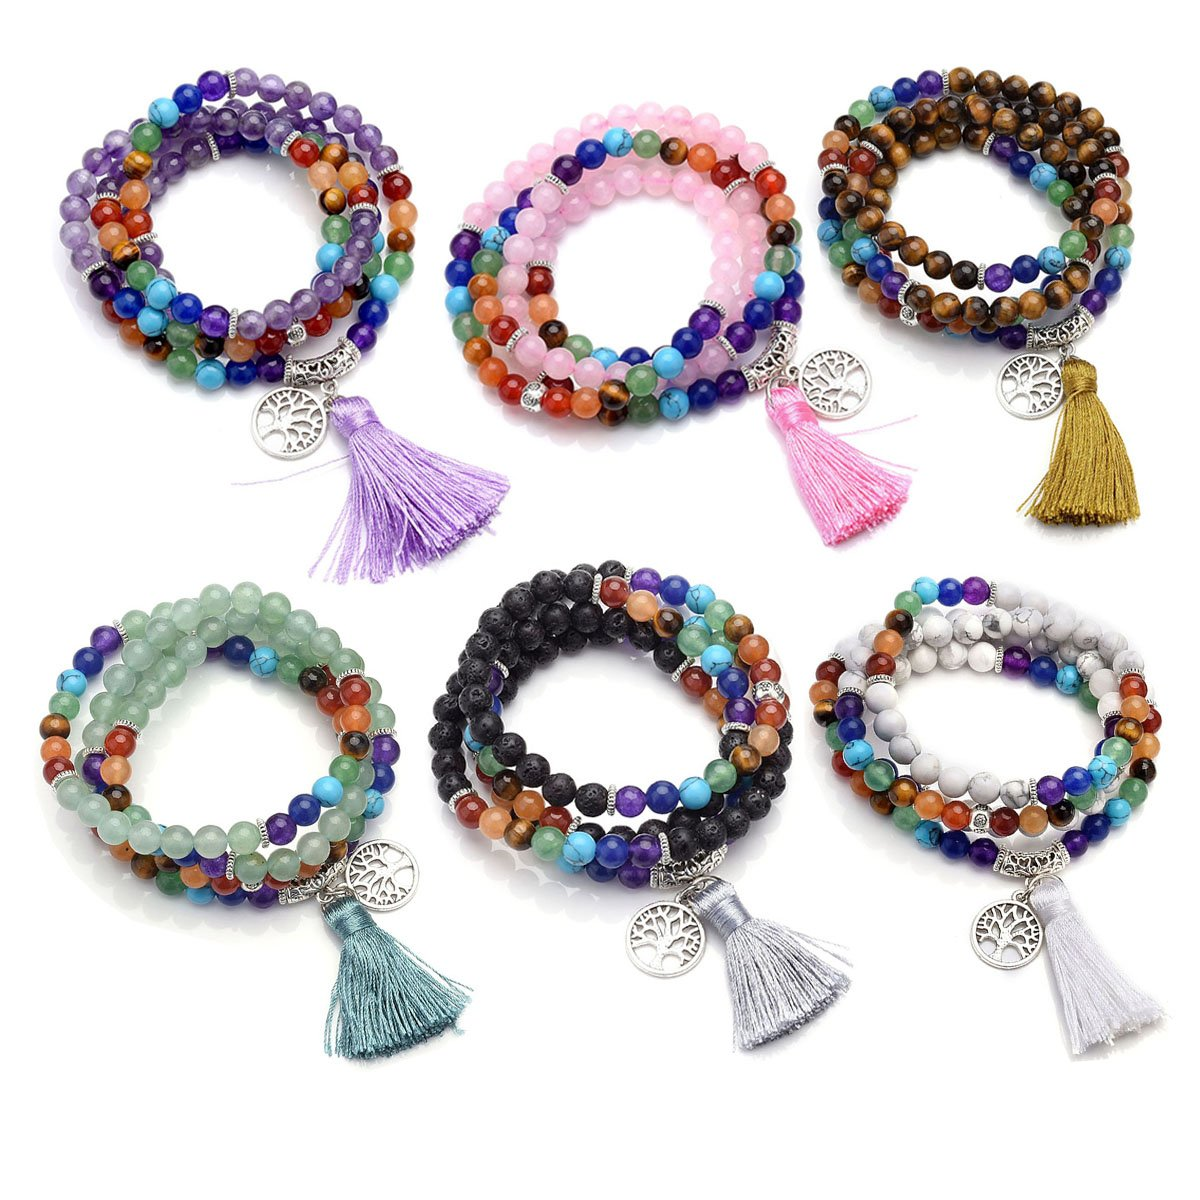 Top Plaza 7 Chakra Buddhist Mala Prayer Beads 108 Meditation Healing Multilayer Bracelet/Necklace W/Tree of Life Tassel Charm (6 Pack)